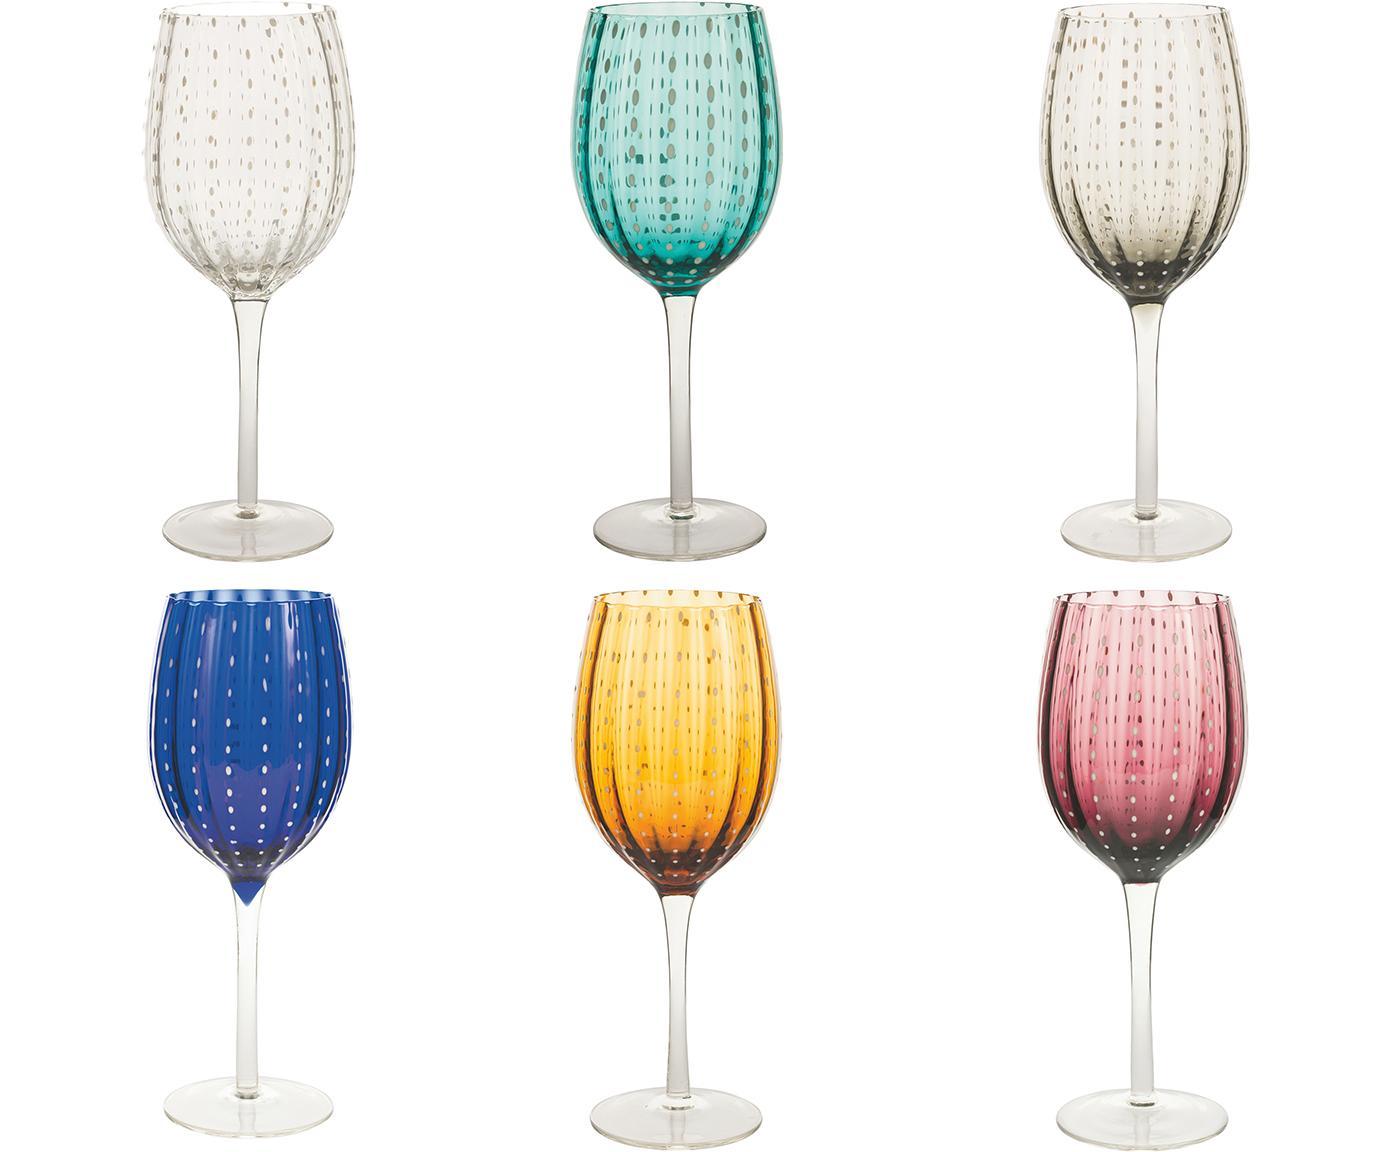 Set 6 bicchieri vino Shiraz, Vetro, Multicolore, Ø 7 x Alt. 23 cm